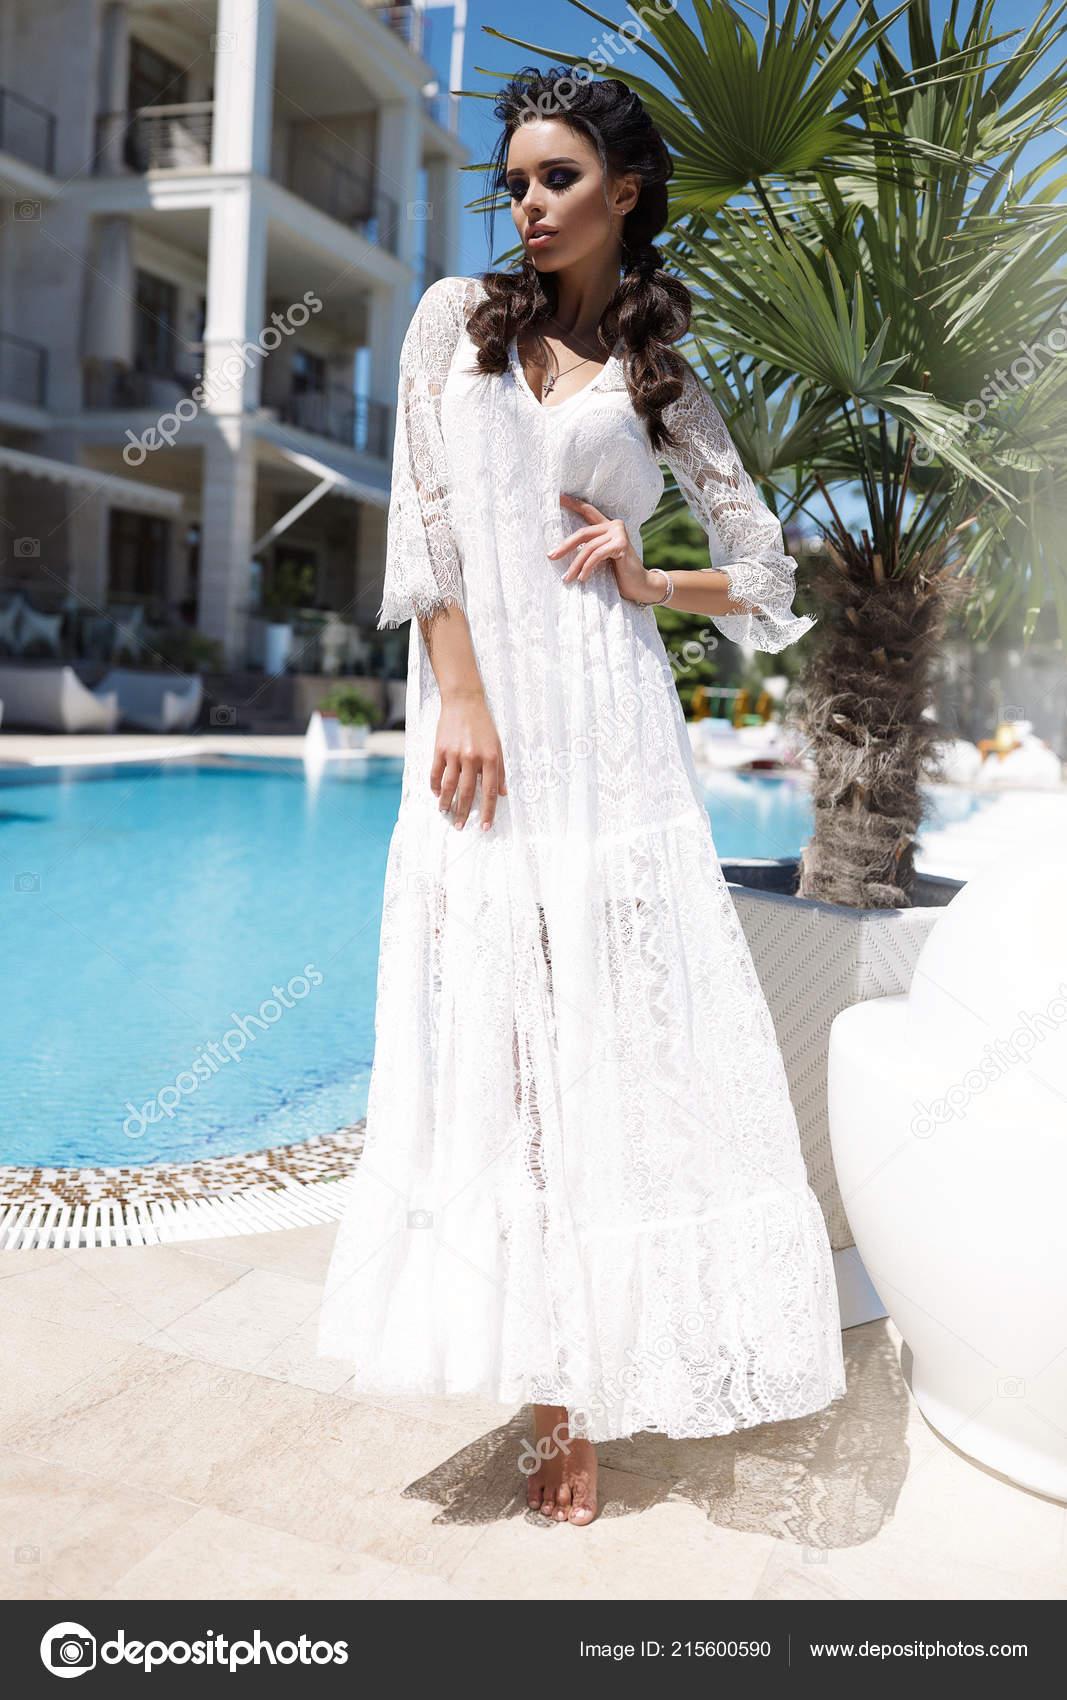 193b2279904a Πανέμορφο Νεαρή Γυναίκα Στο Λευκό Φως Φόρεμα Καλοκαίρι Ζεστό Brades ...